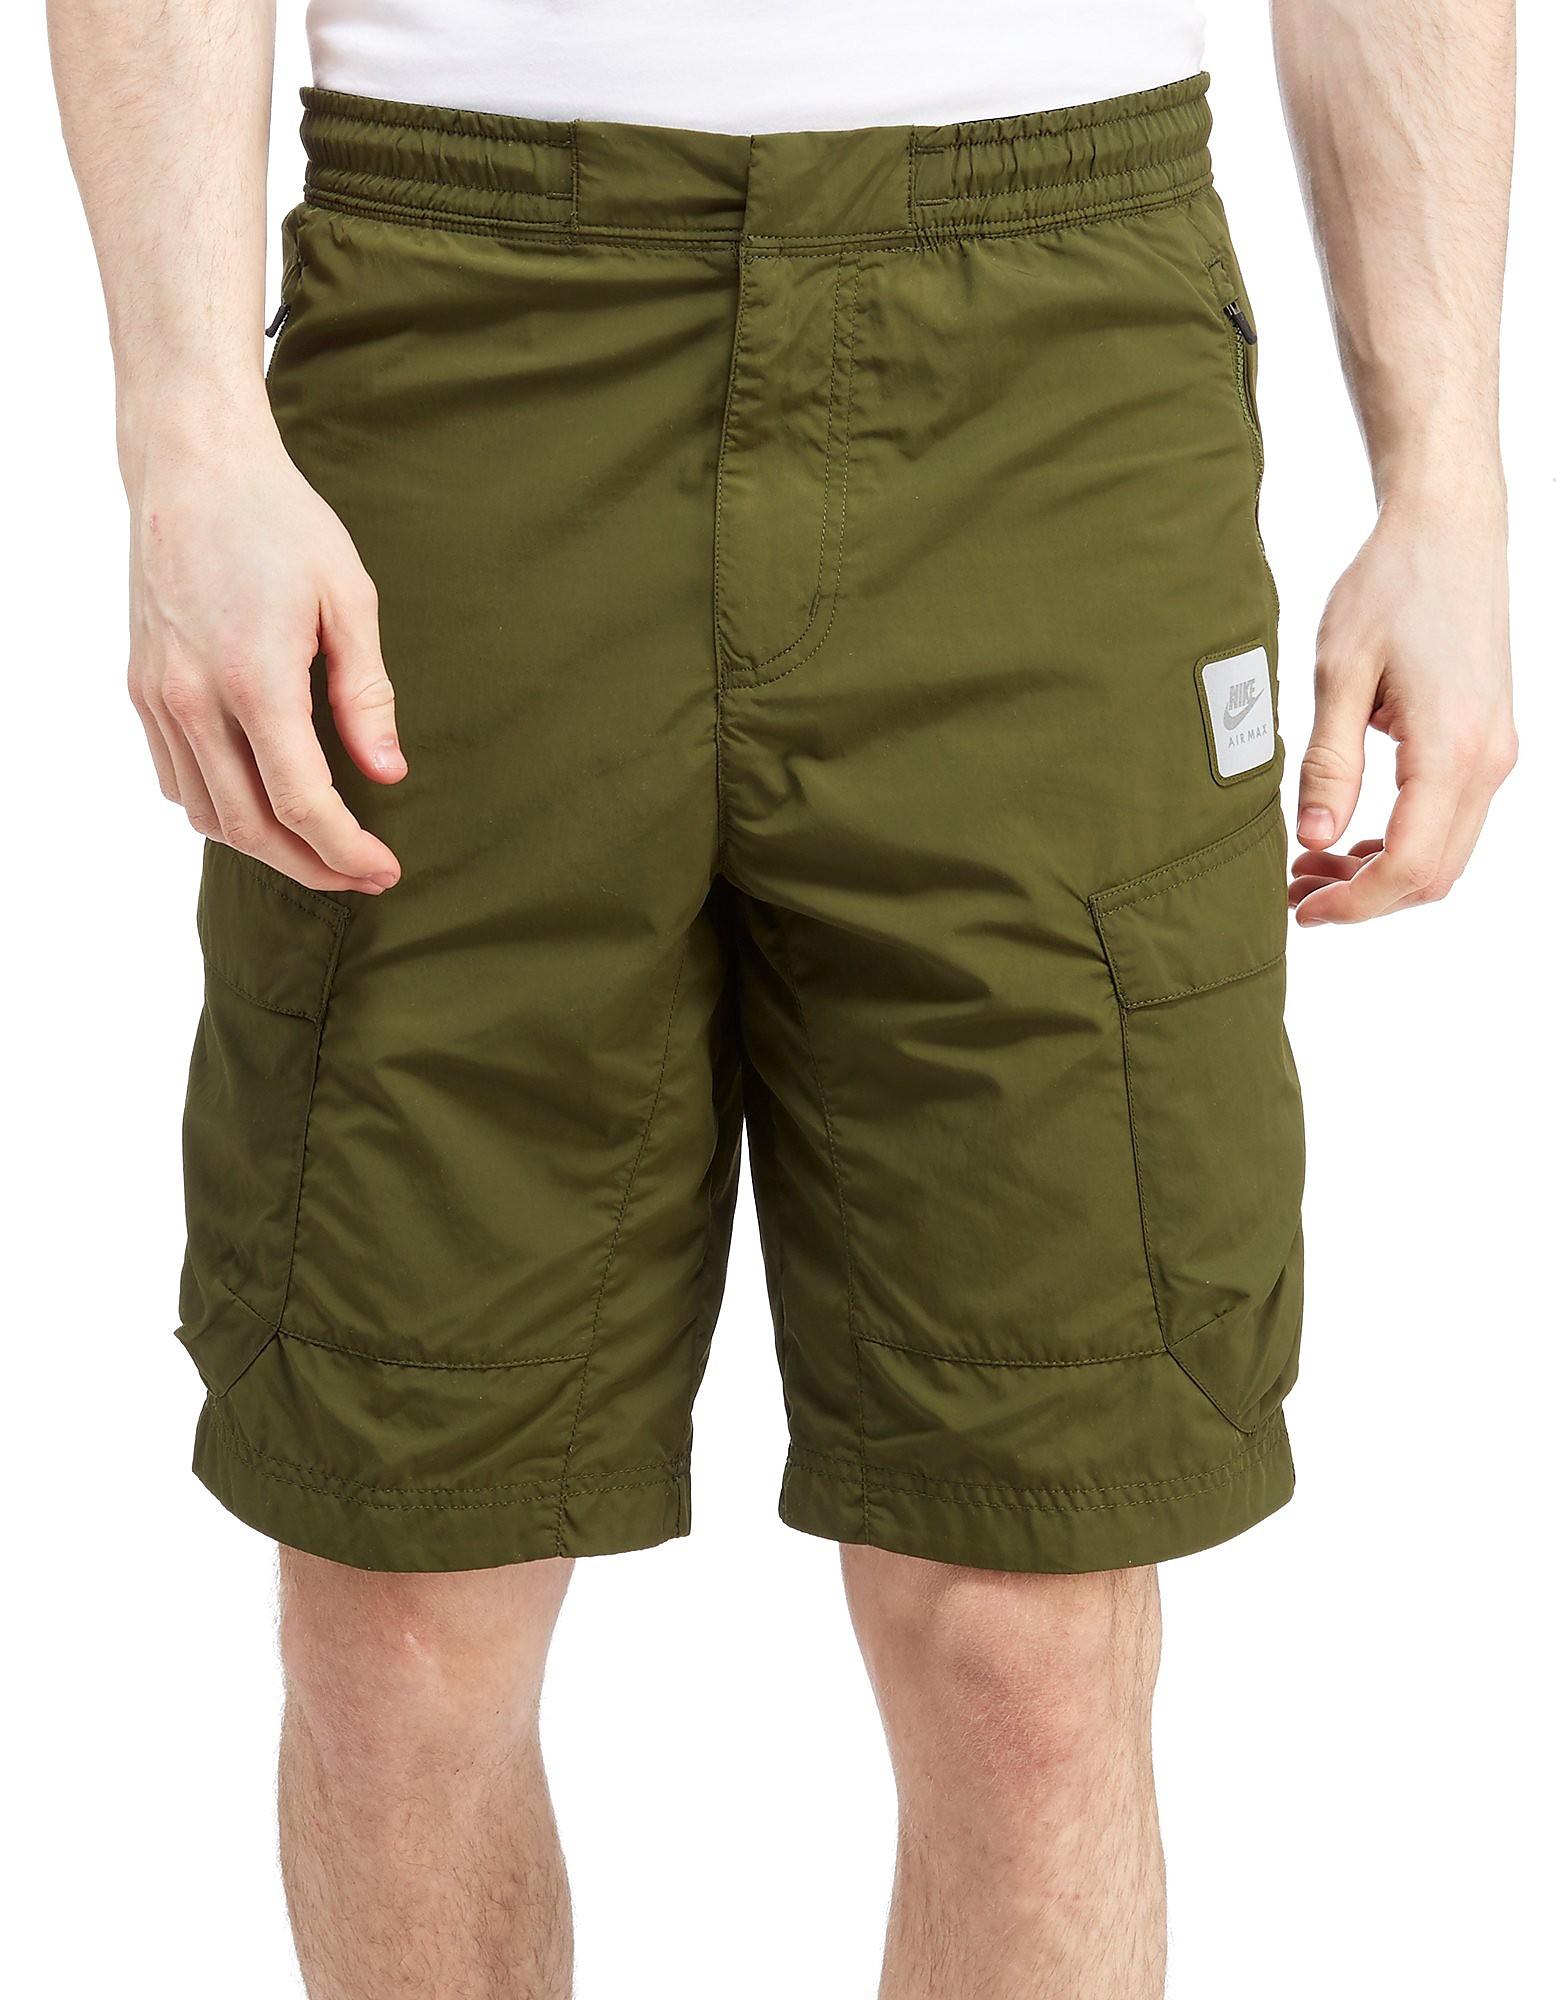 Nike Air Max Cargo Shorts